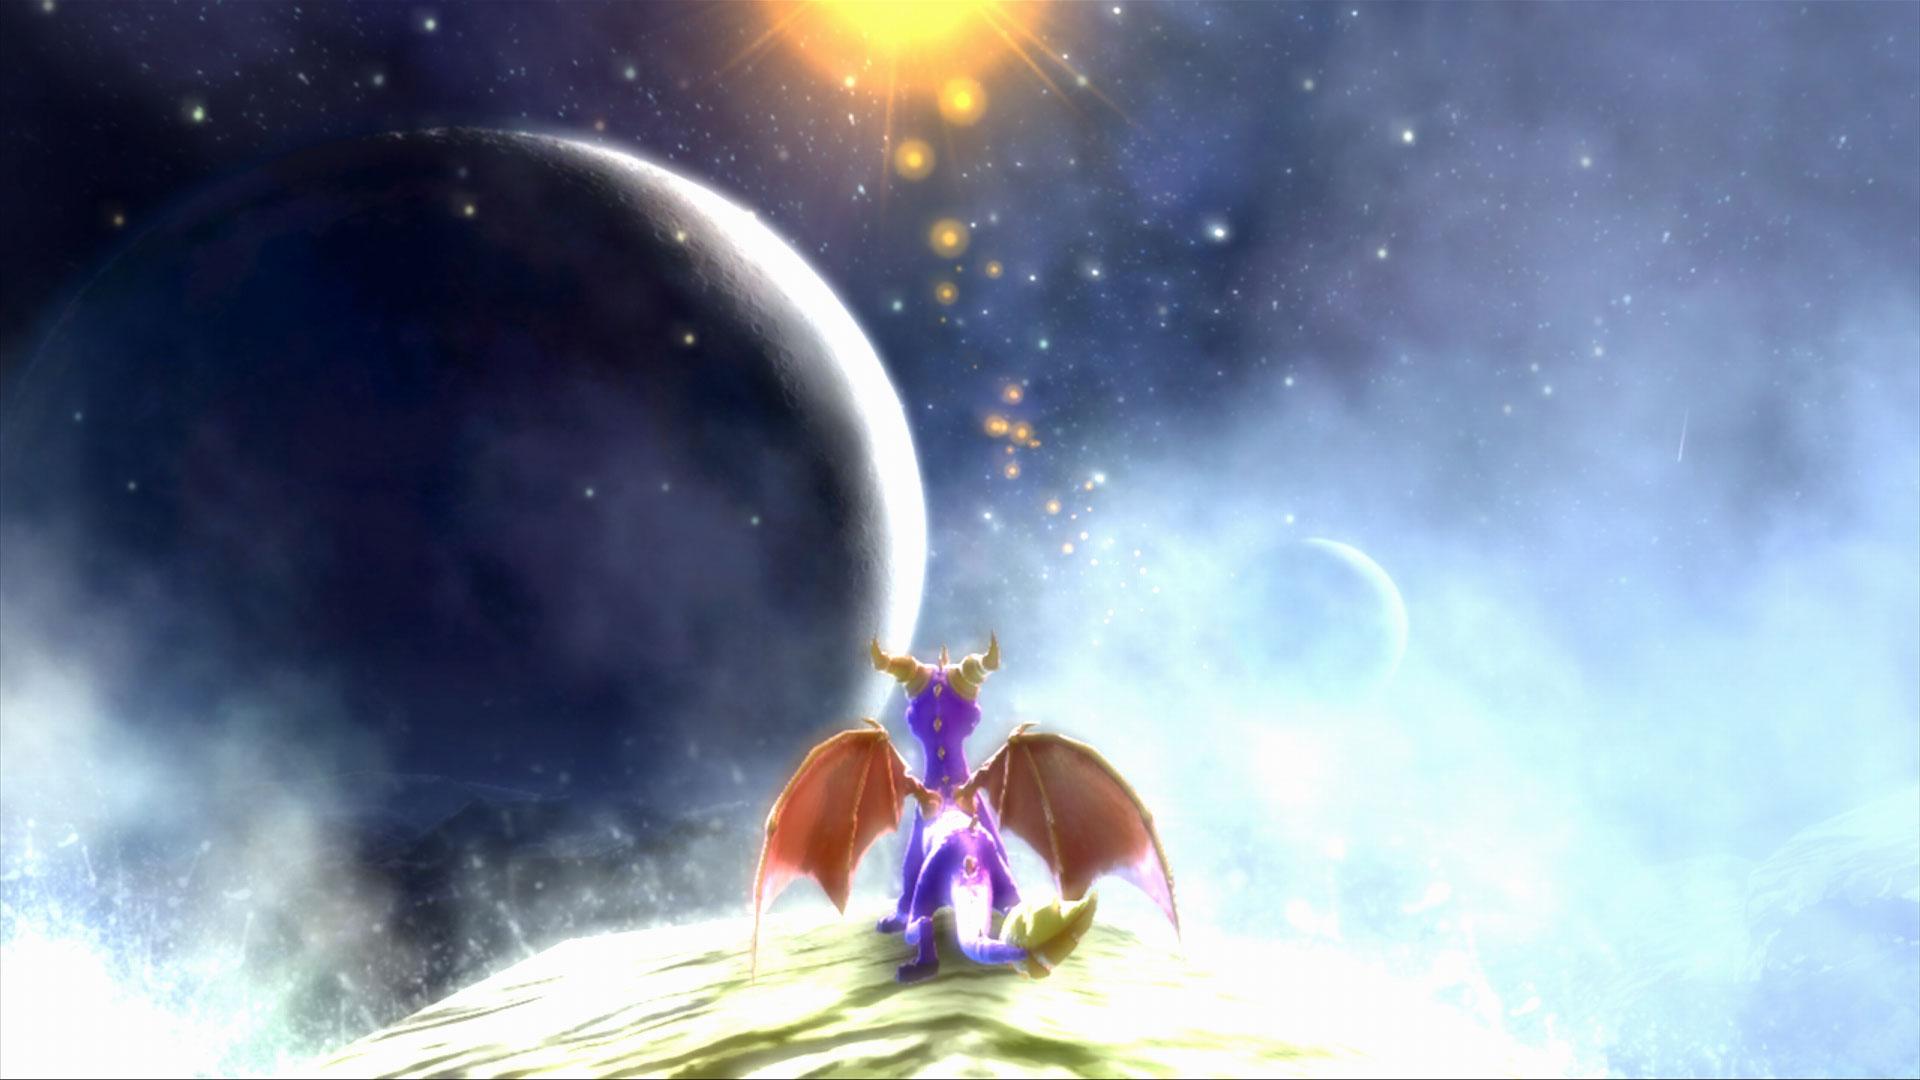 Darkspyro the legend of spyro dawn of the dragon gallery - Spyro wallpaper ...